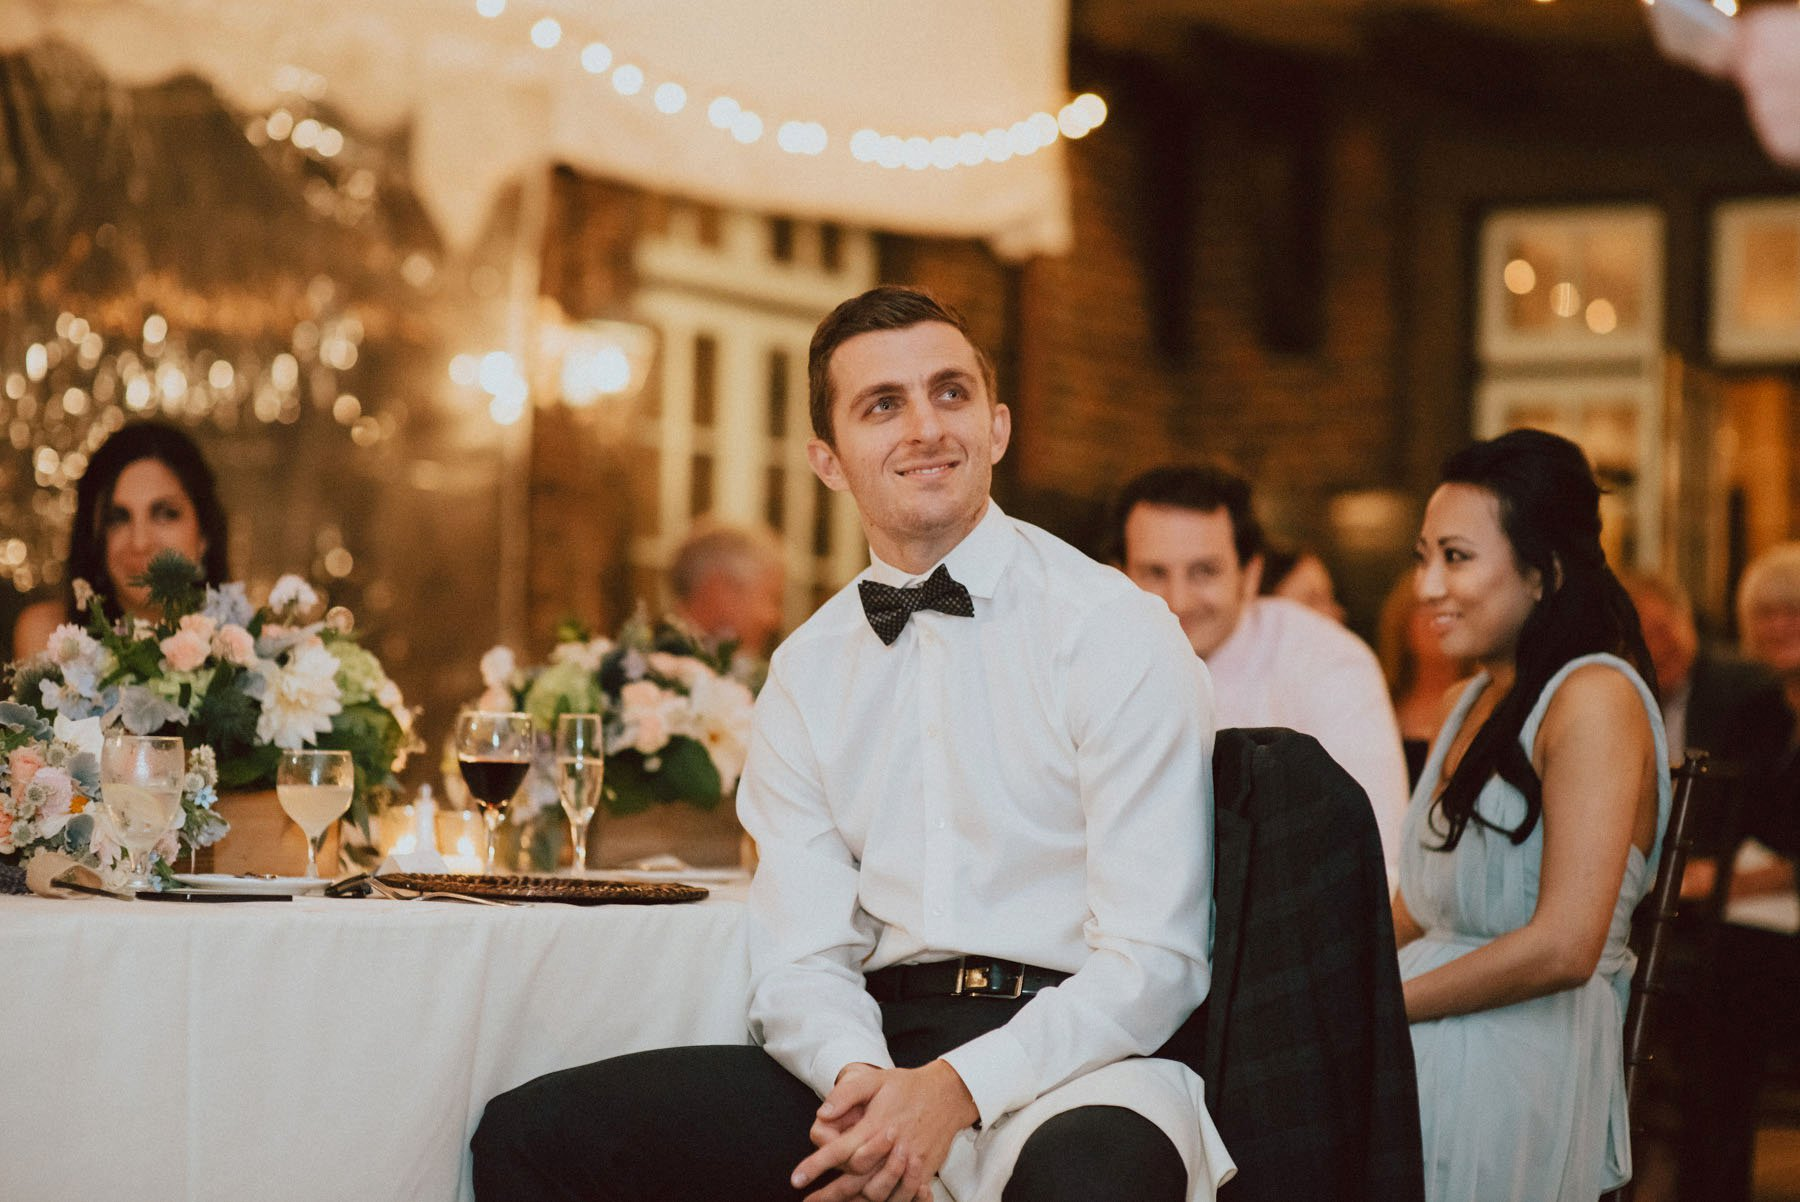 greenville-country-club-wedding-139.jpg